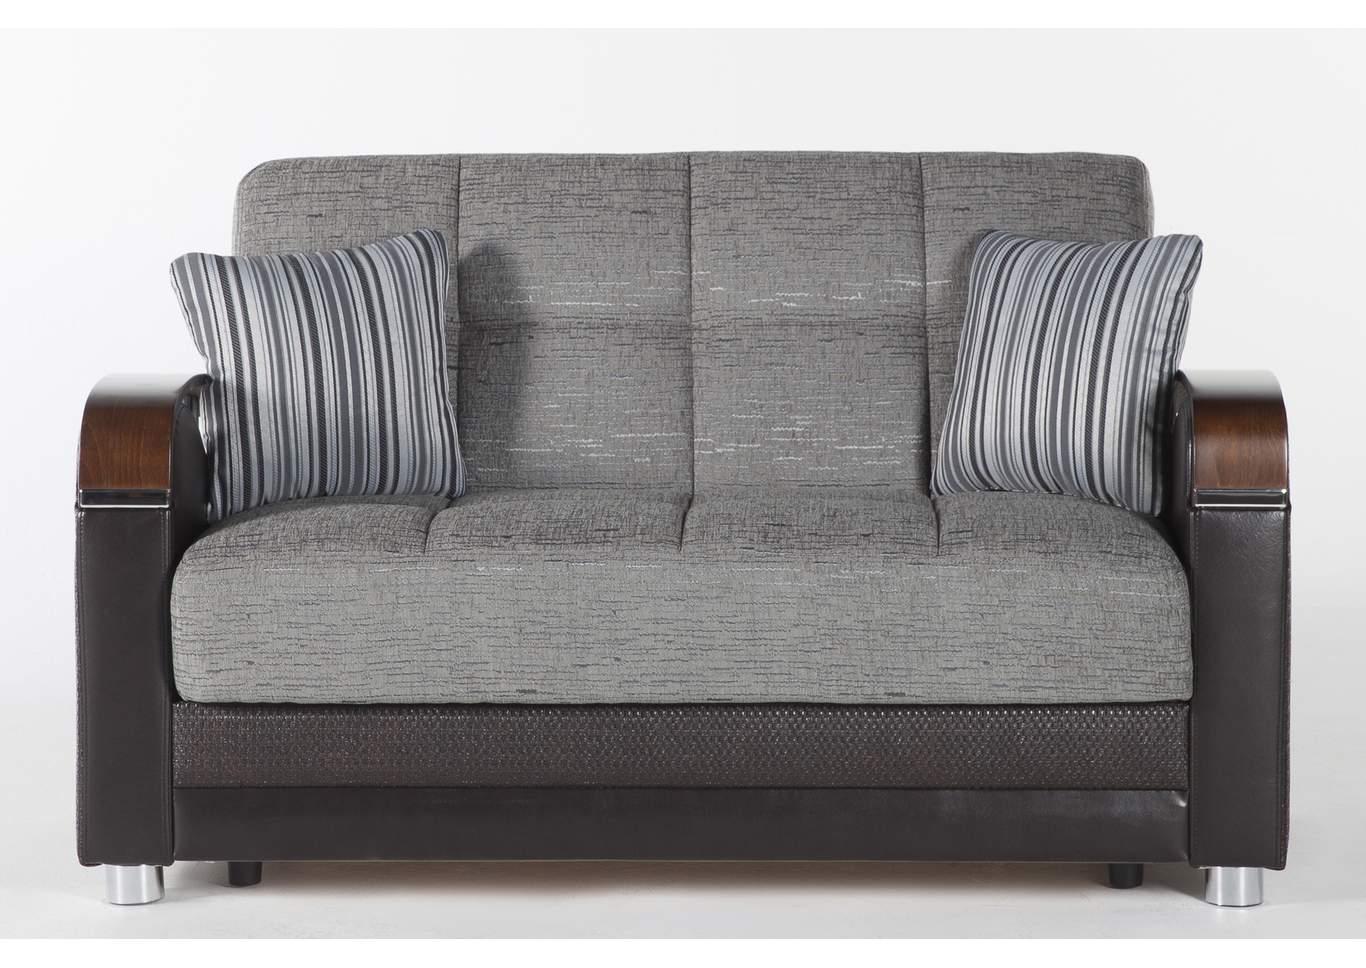 Luna Fulya Gray Loveseat Sleeper Sofa Paivas Furniture